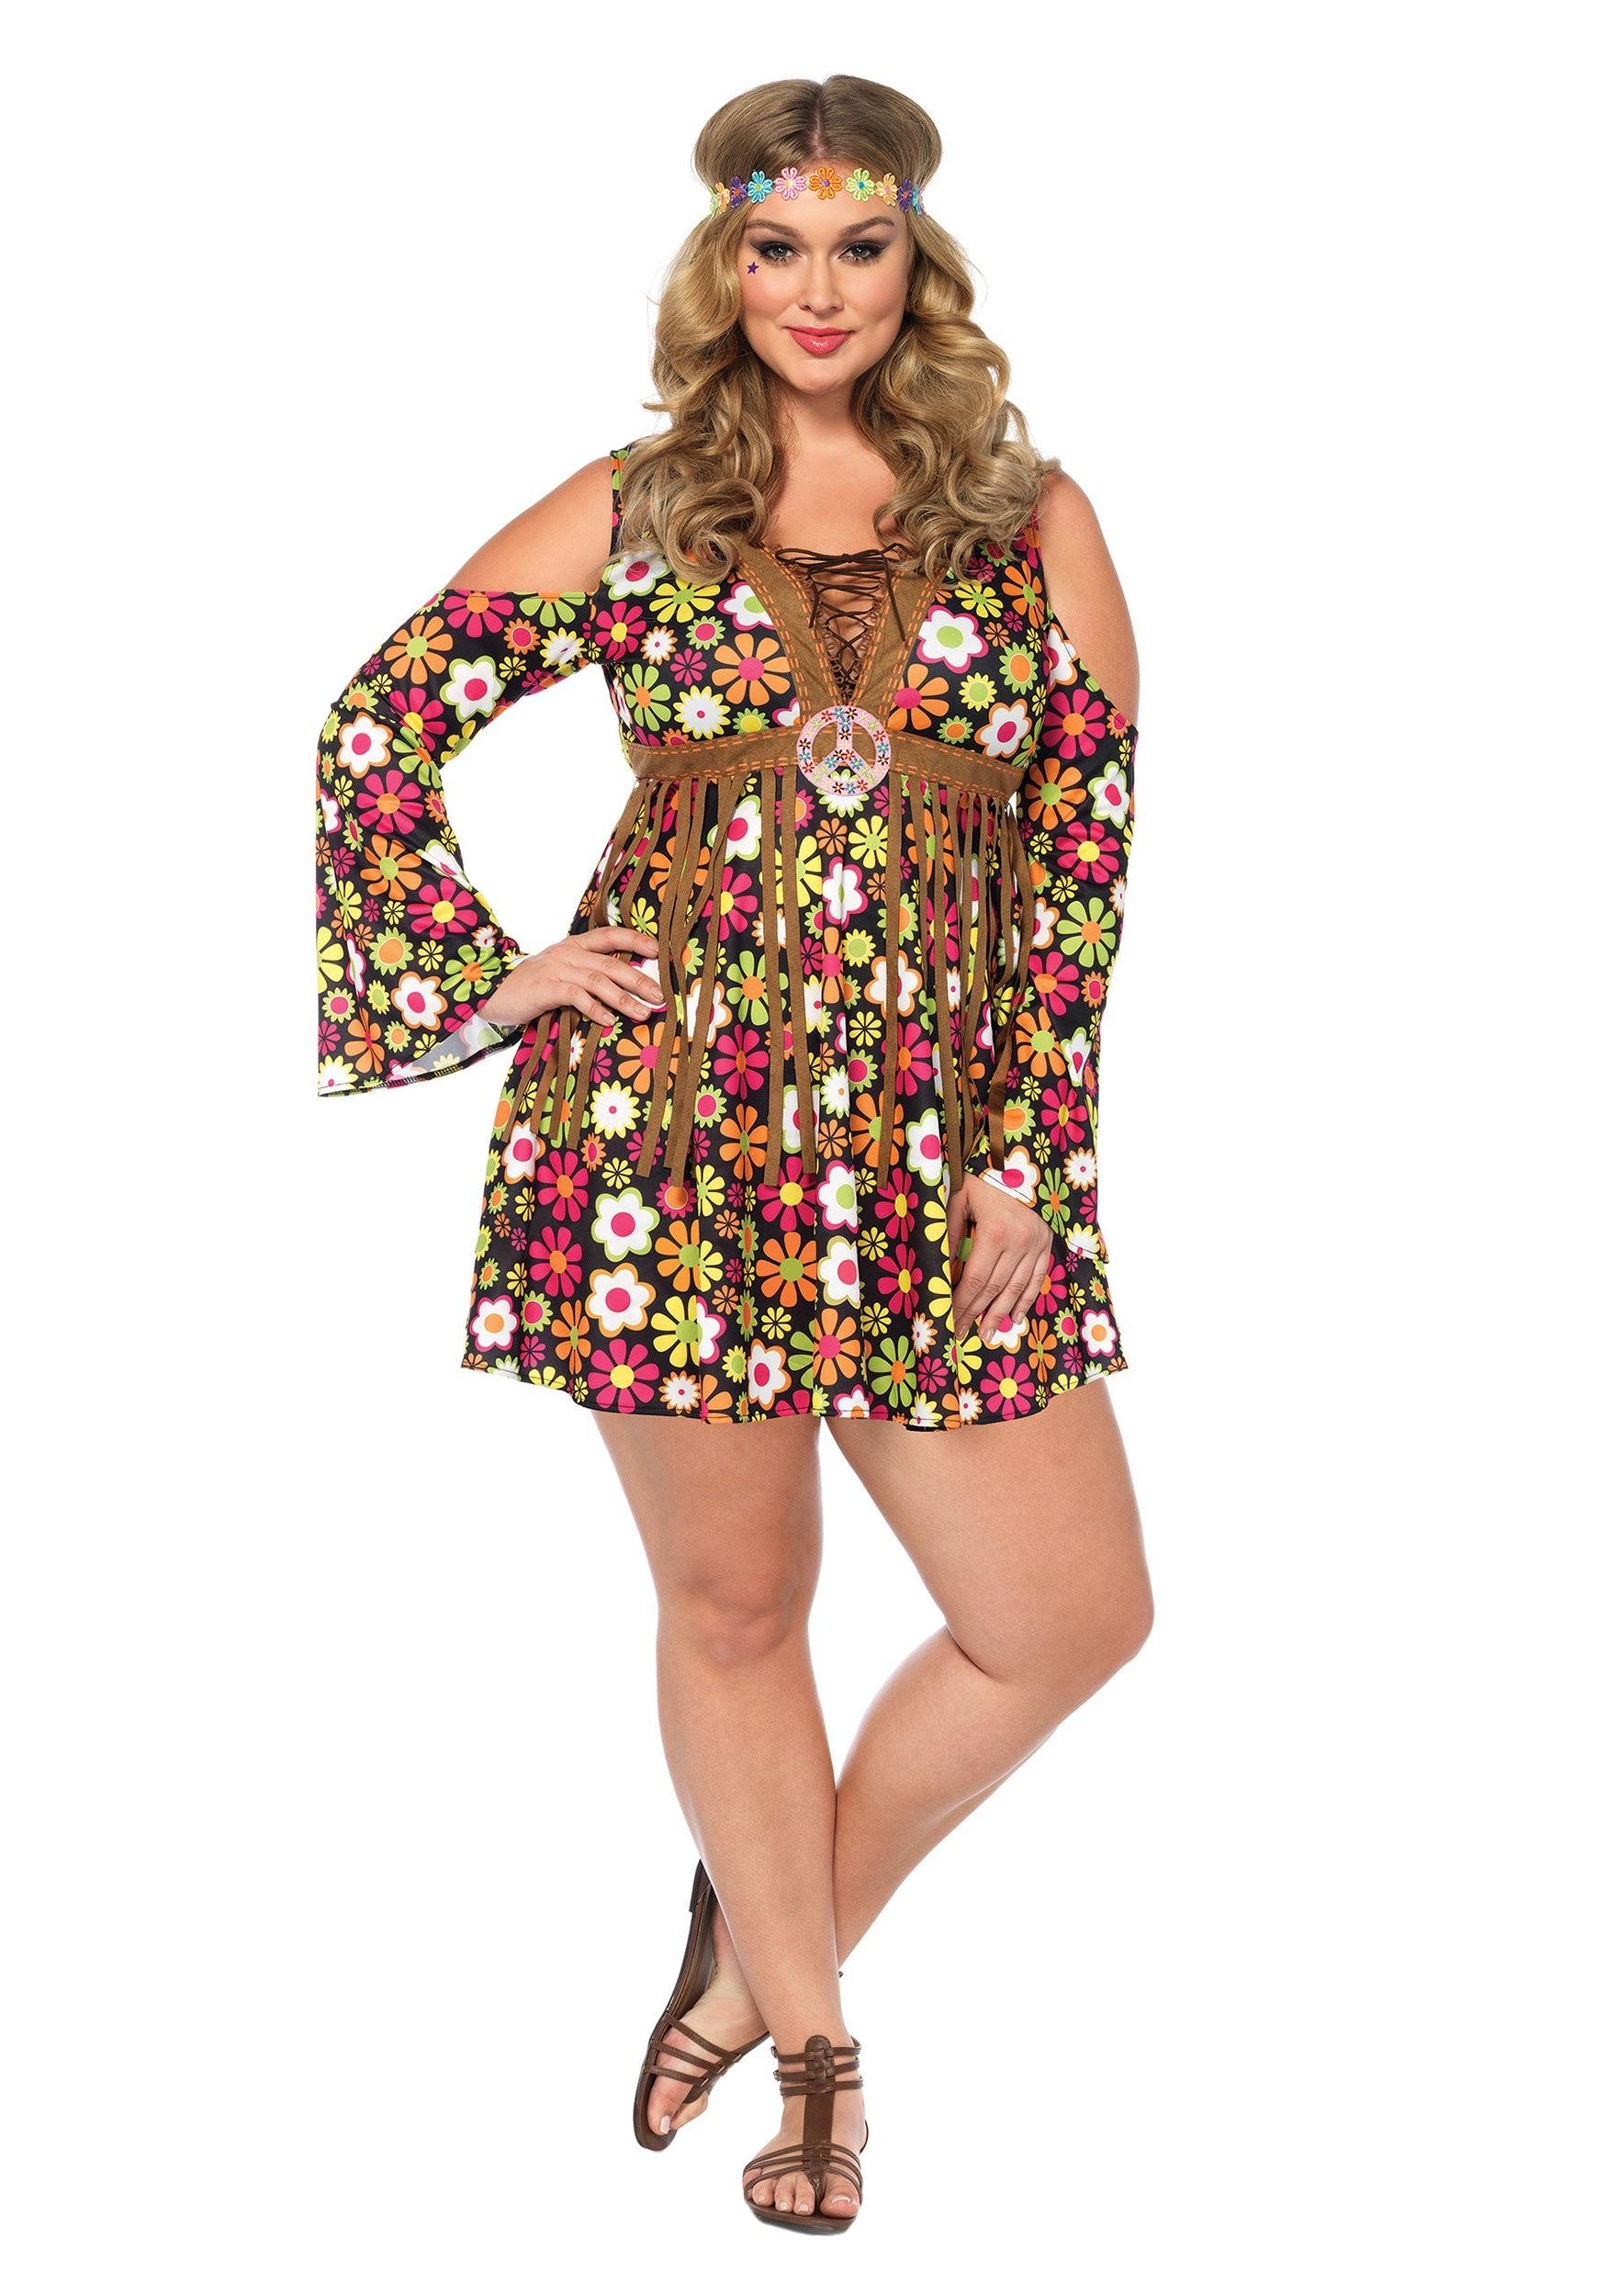 Plus Starflower Hippie Costume  sc 1 st  Halloween Costumes & 70s Outfits u0026 Costumes For Halloween - 1970u0027s Costumes